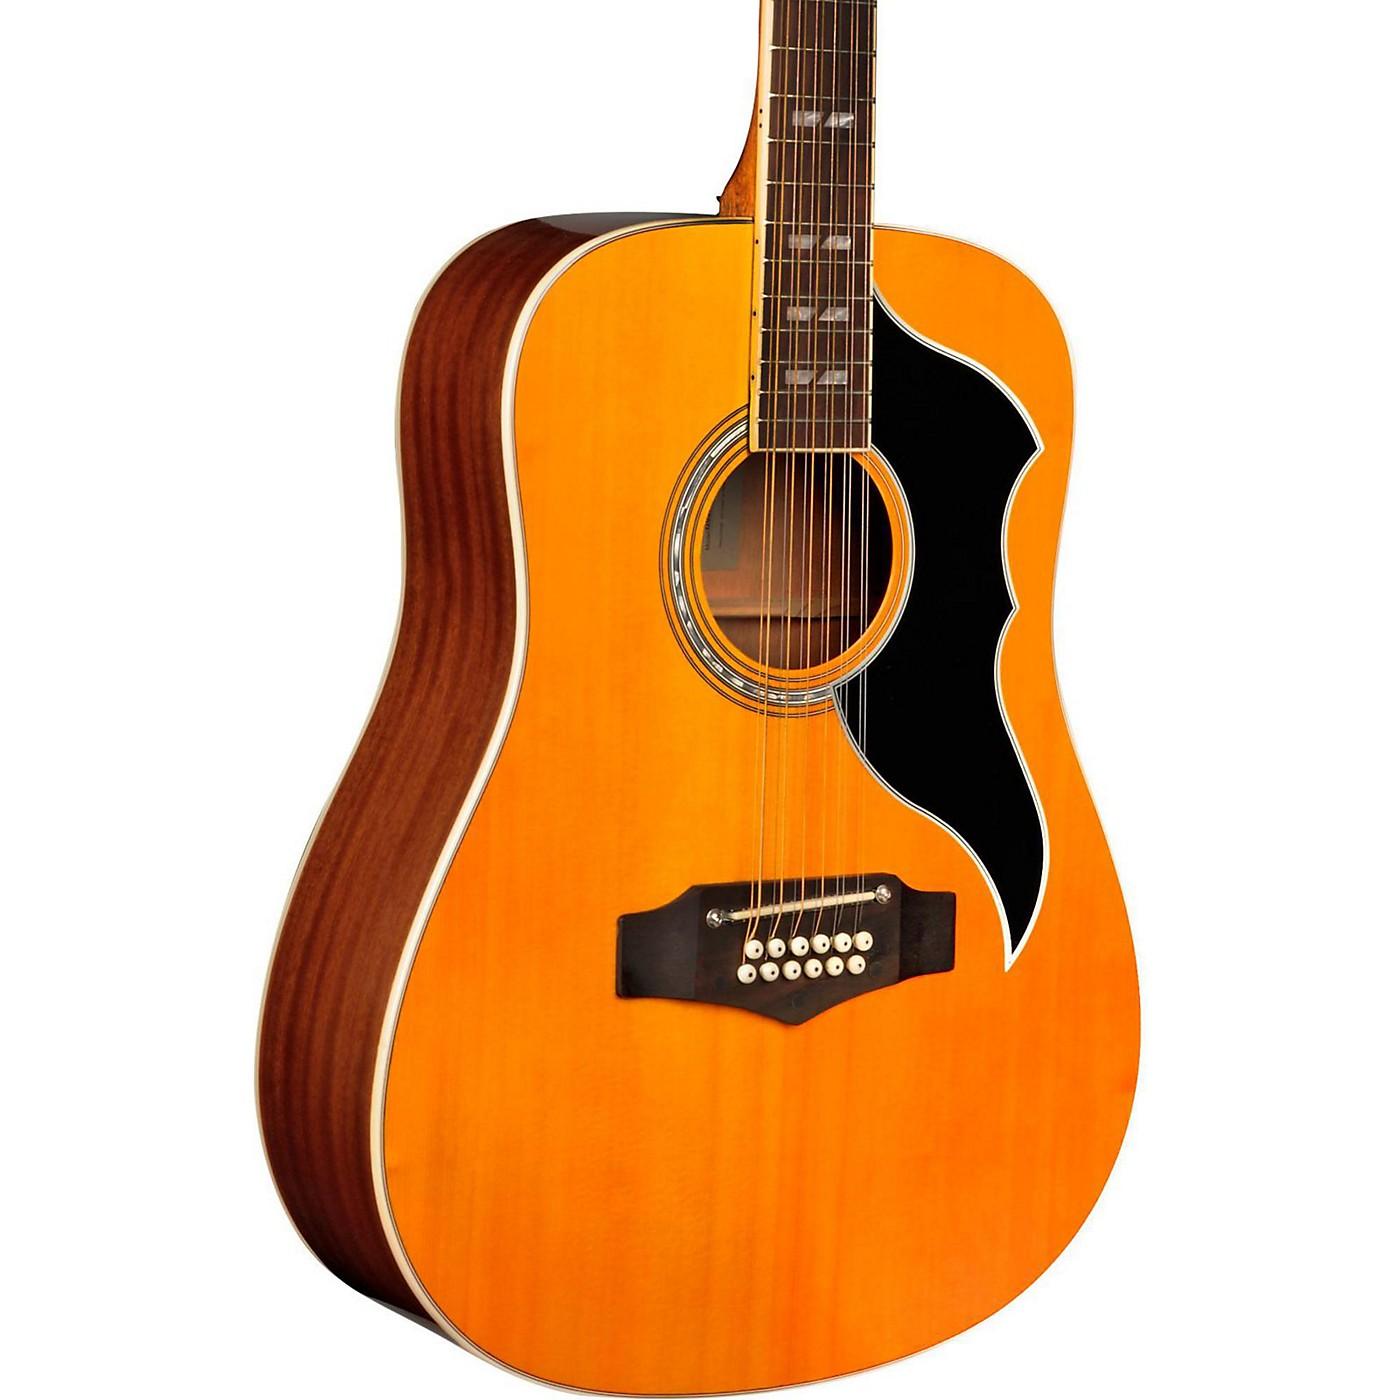 EKO Ranger XII Vintage Reissue 12-String Dreadnought Acoustic Guitar thumbnail